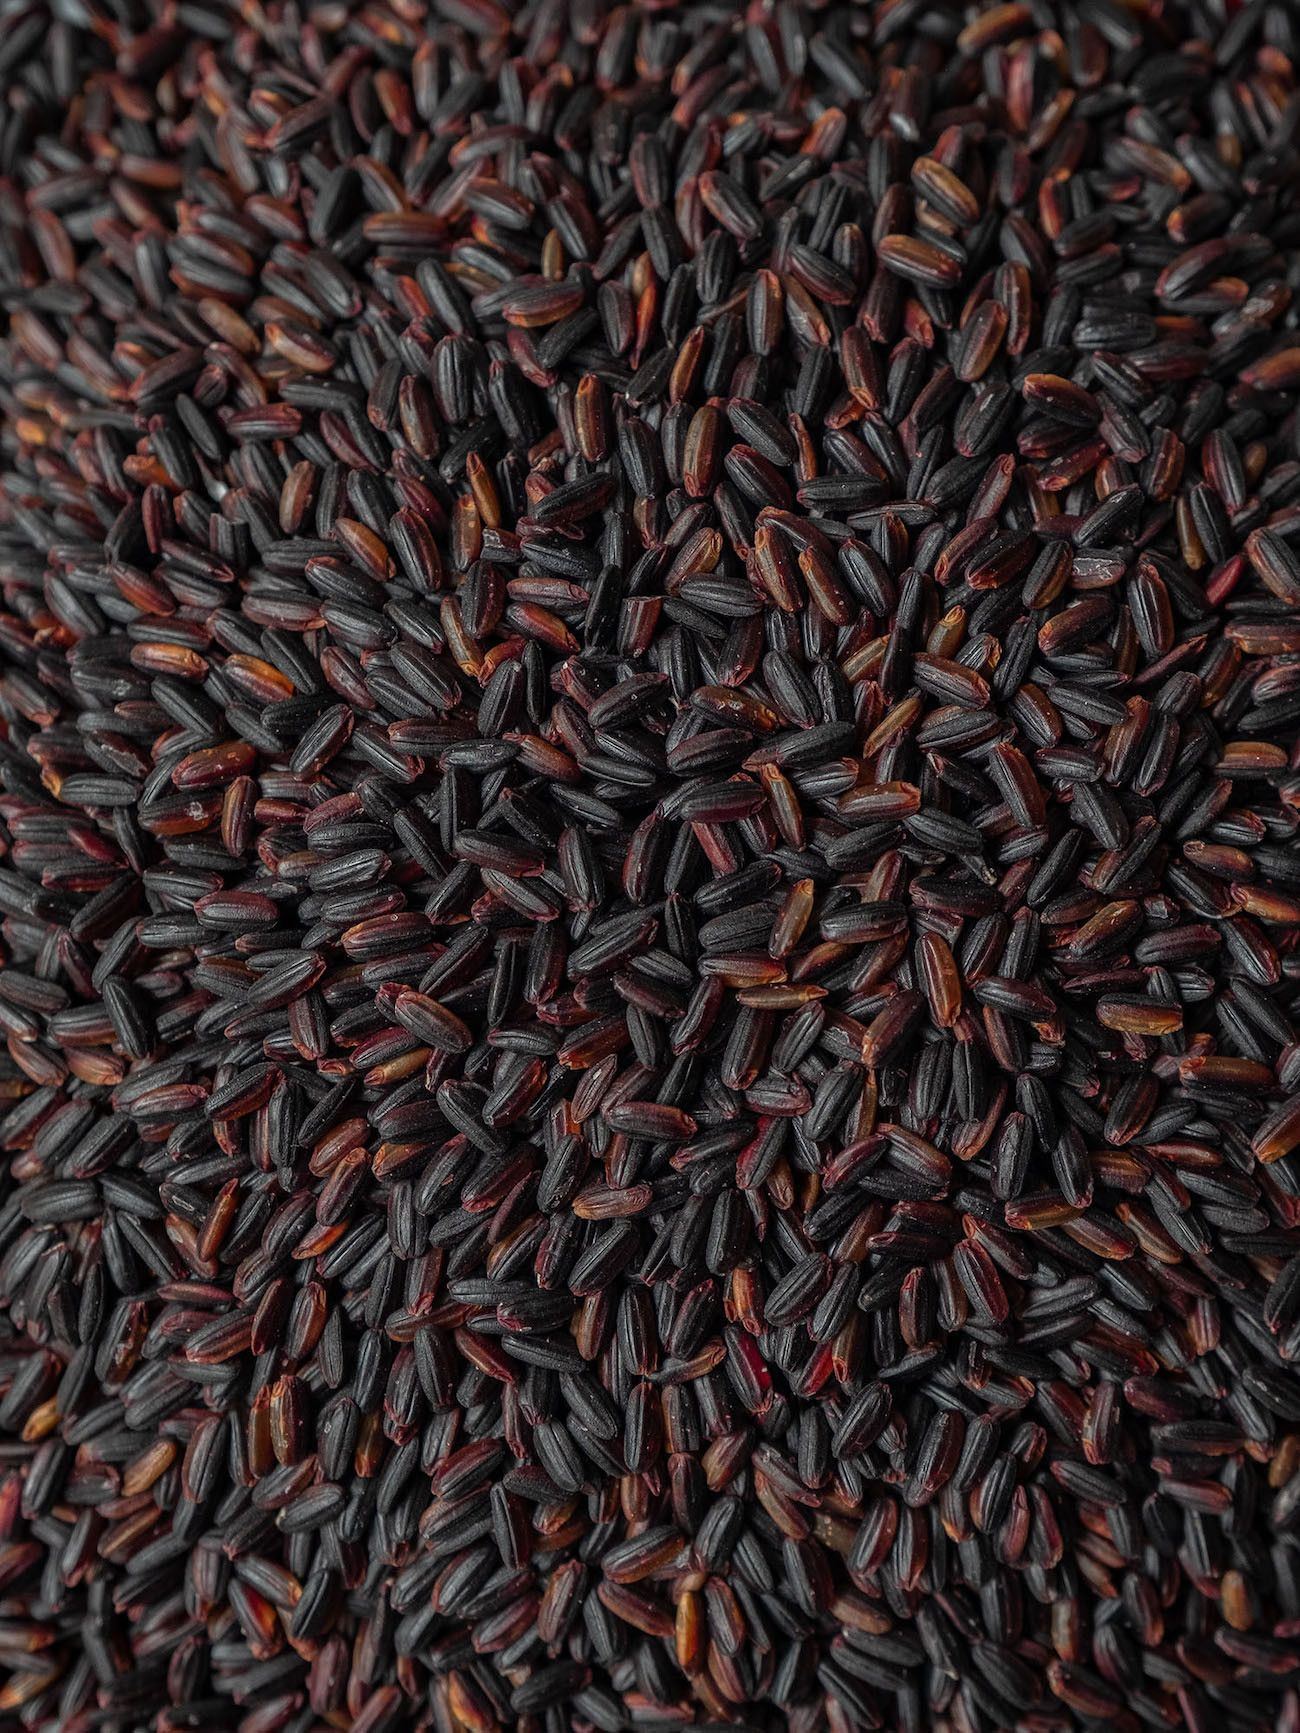 Foodblog, Rezept Kürbis Curry Püree mit zitronen Brokkoli und schwarzem Reis, Reis_1